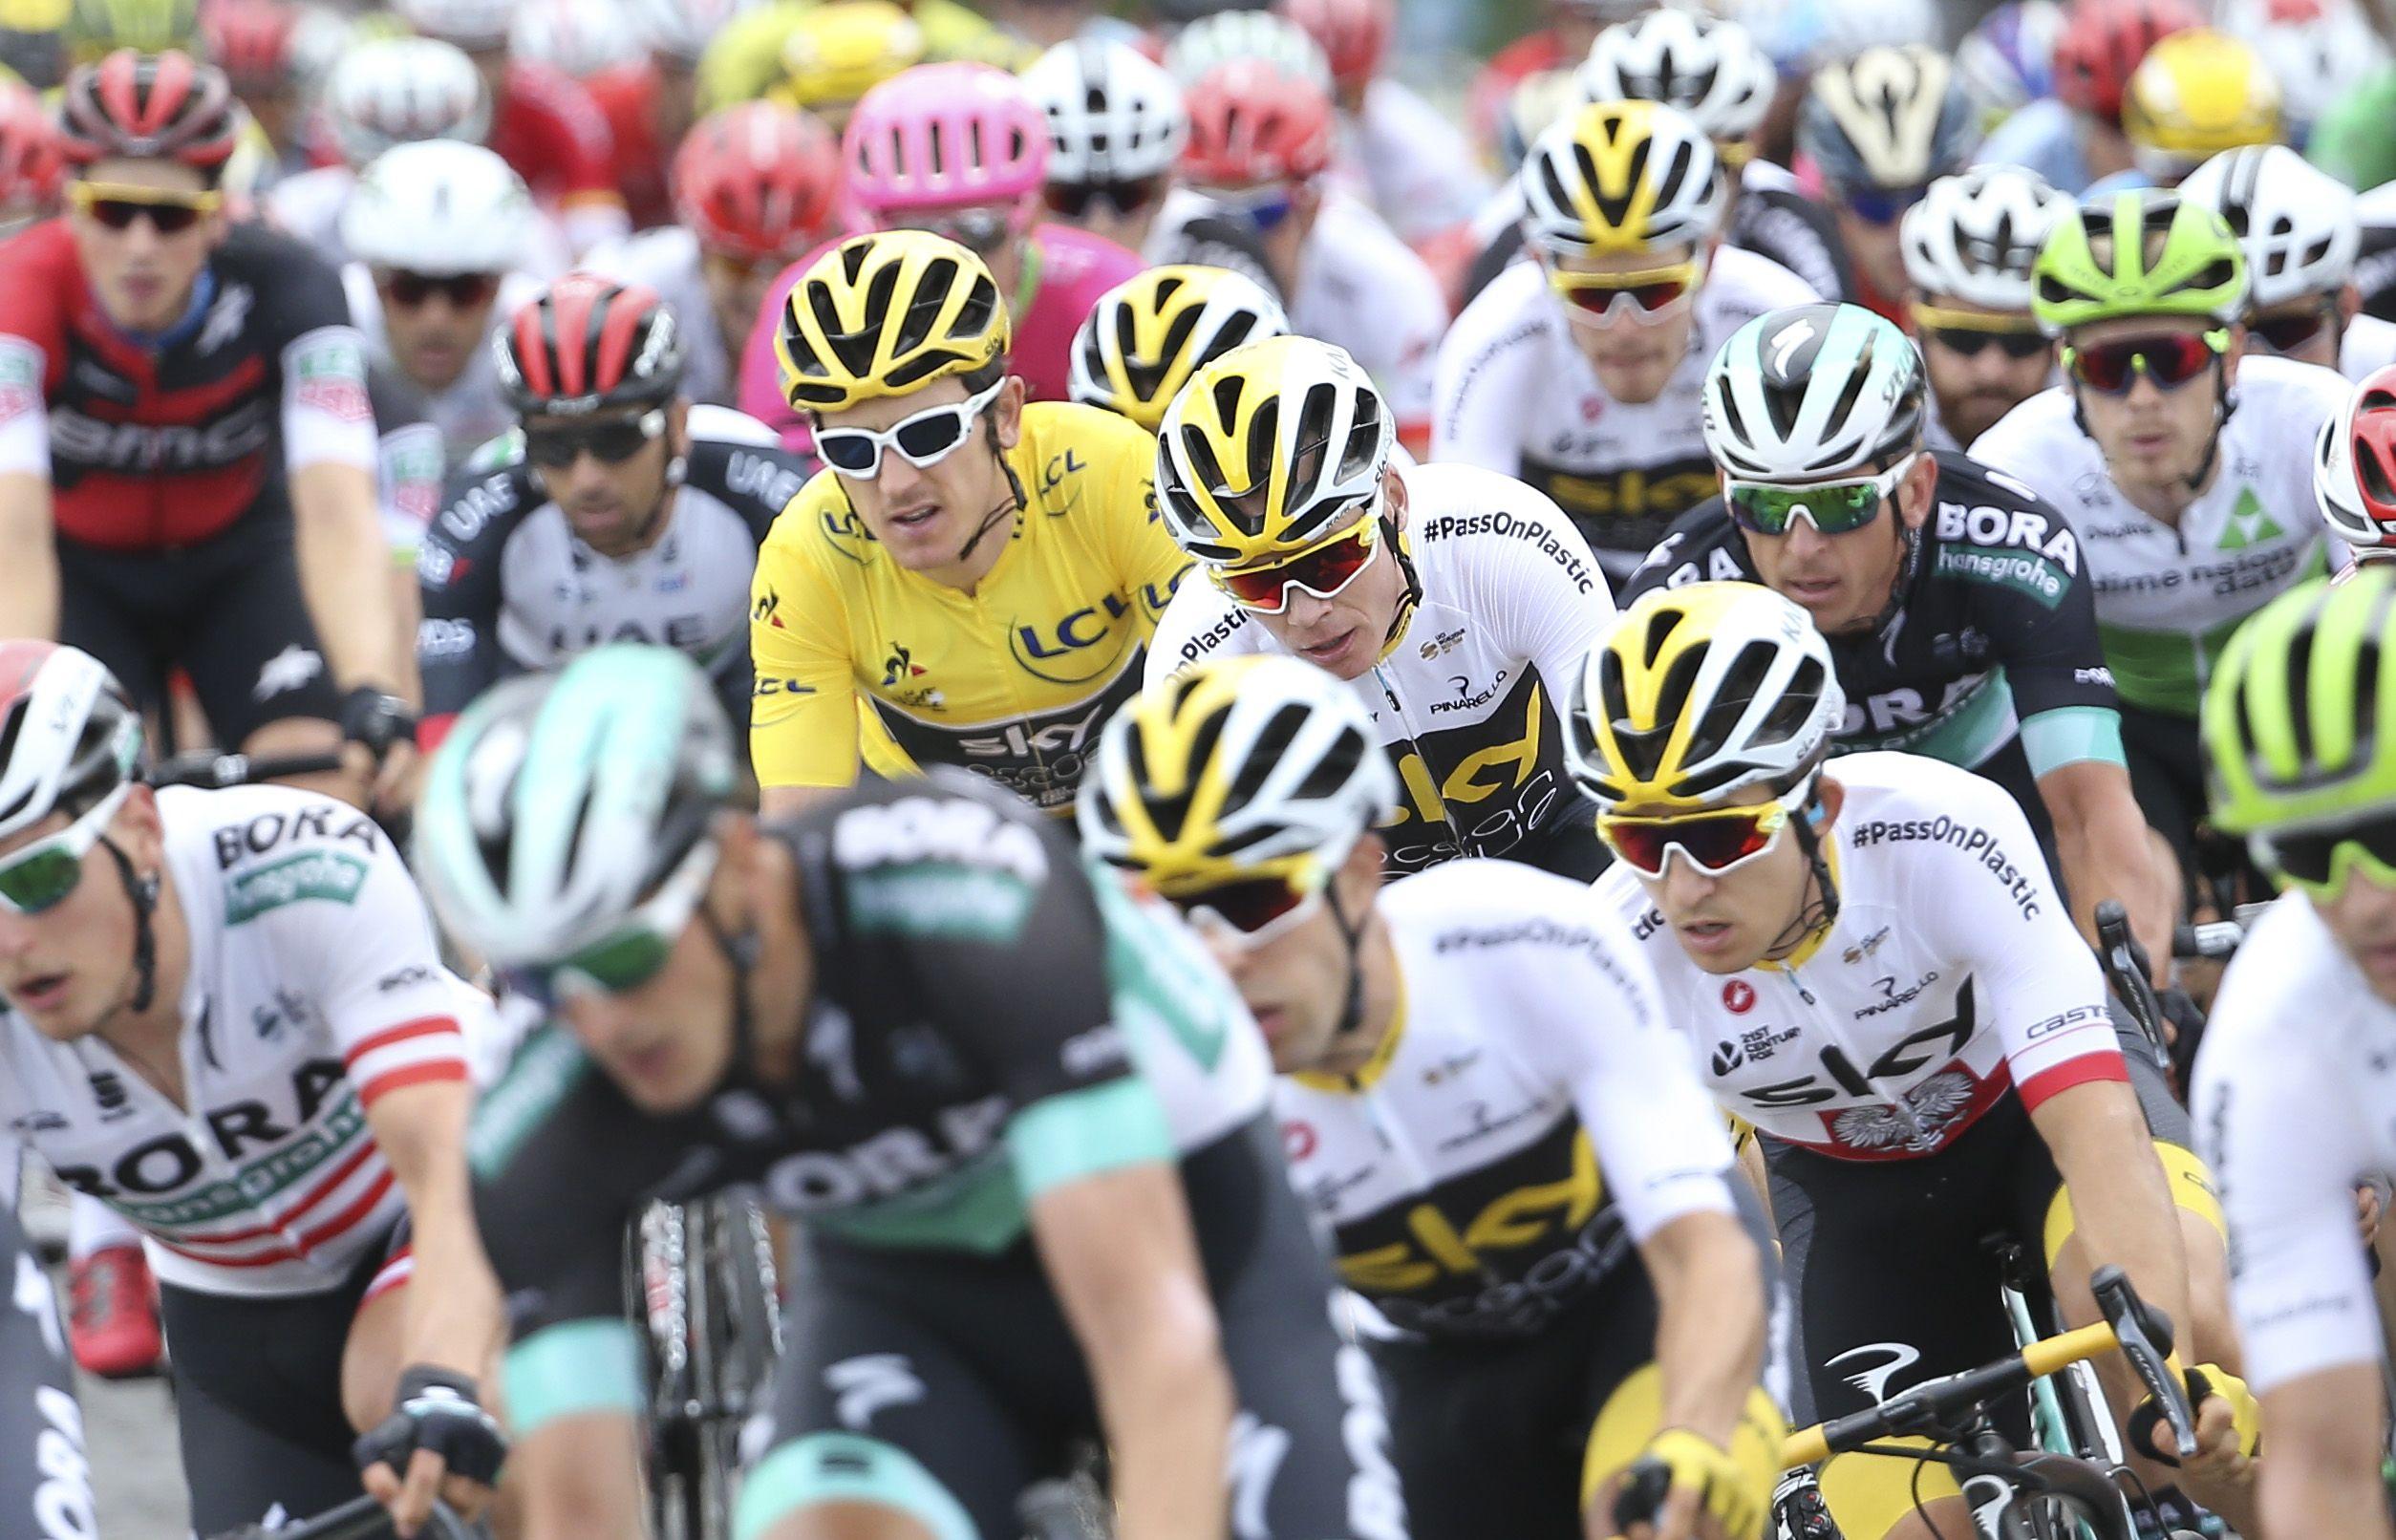 How to Watch the Tour de France - Stream Tour de France 2019